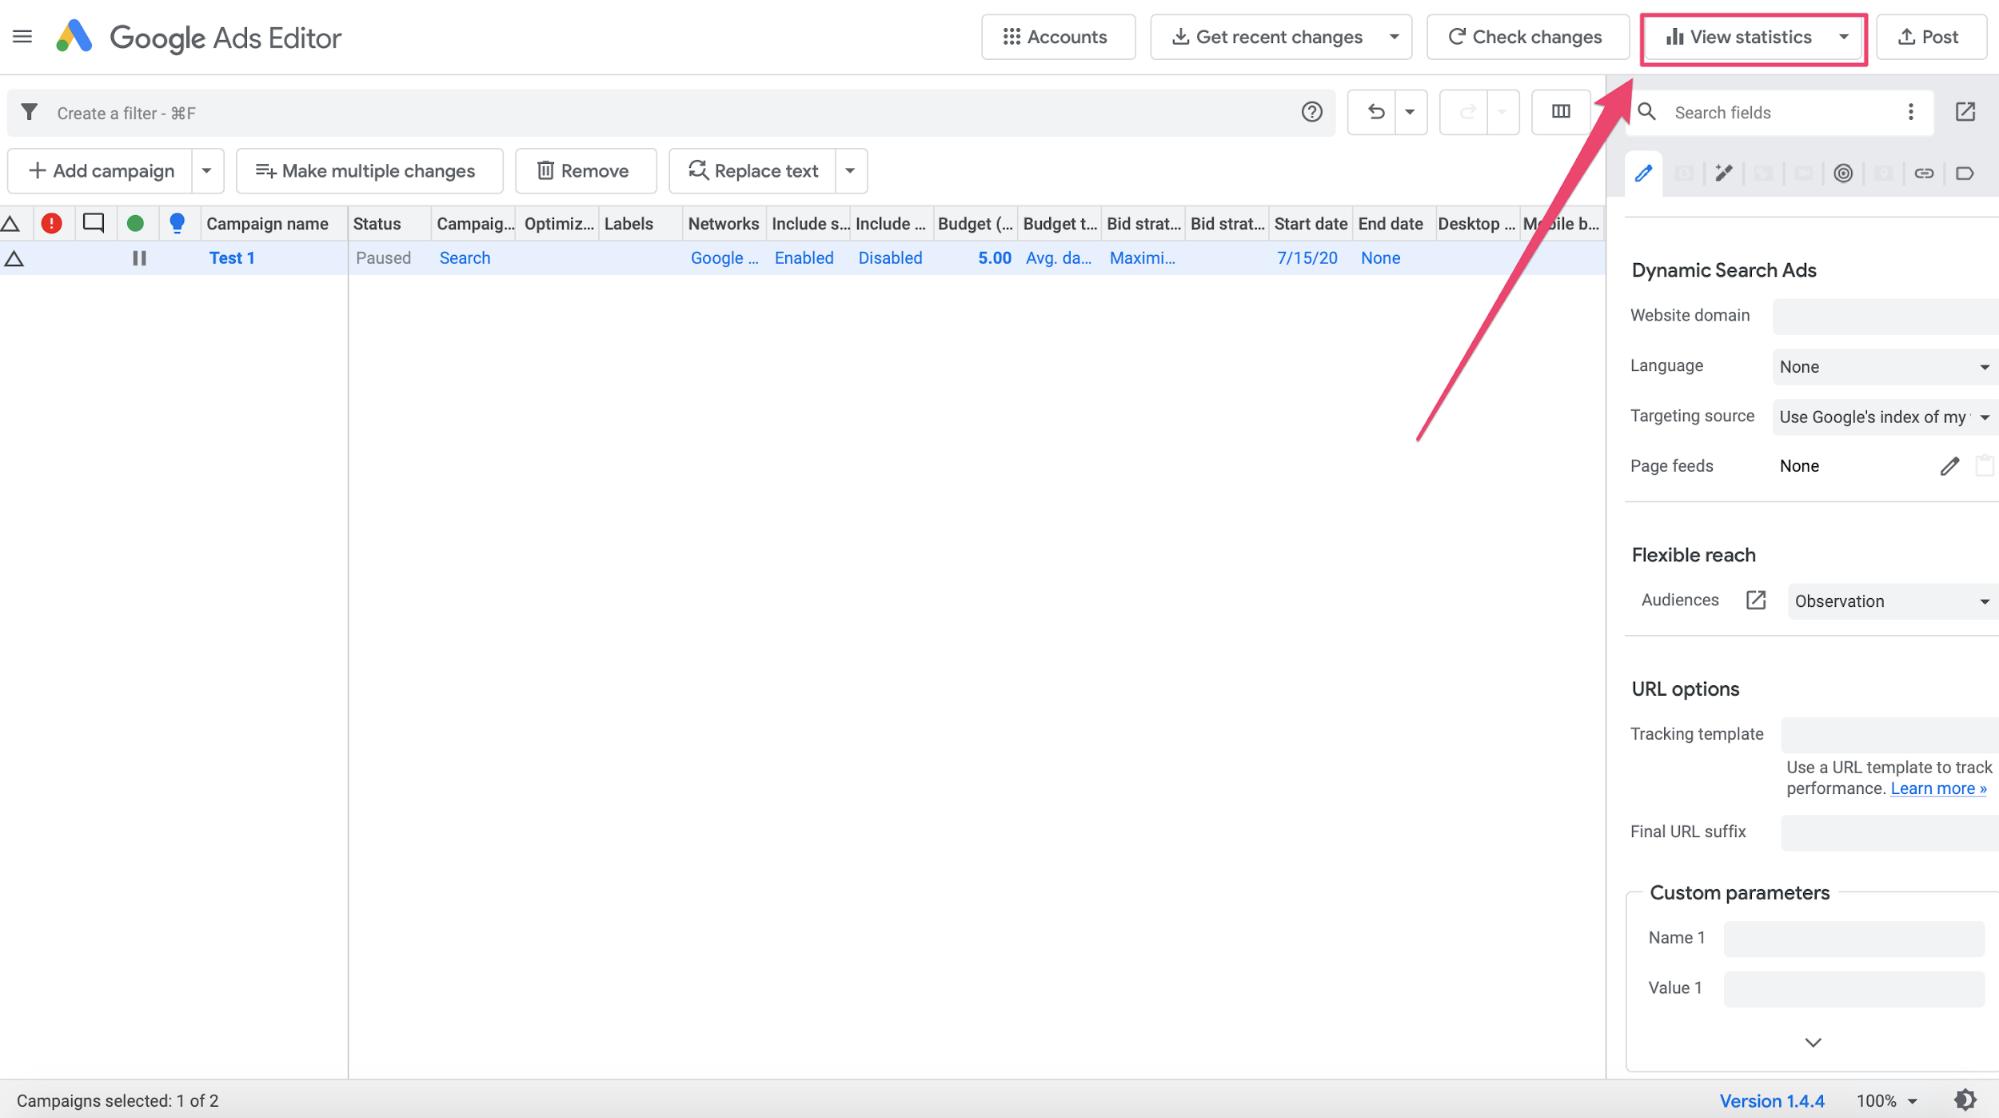 Google Ads Editor statistics function